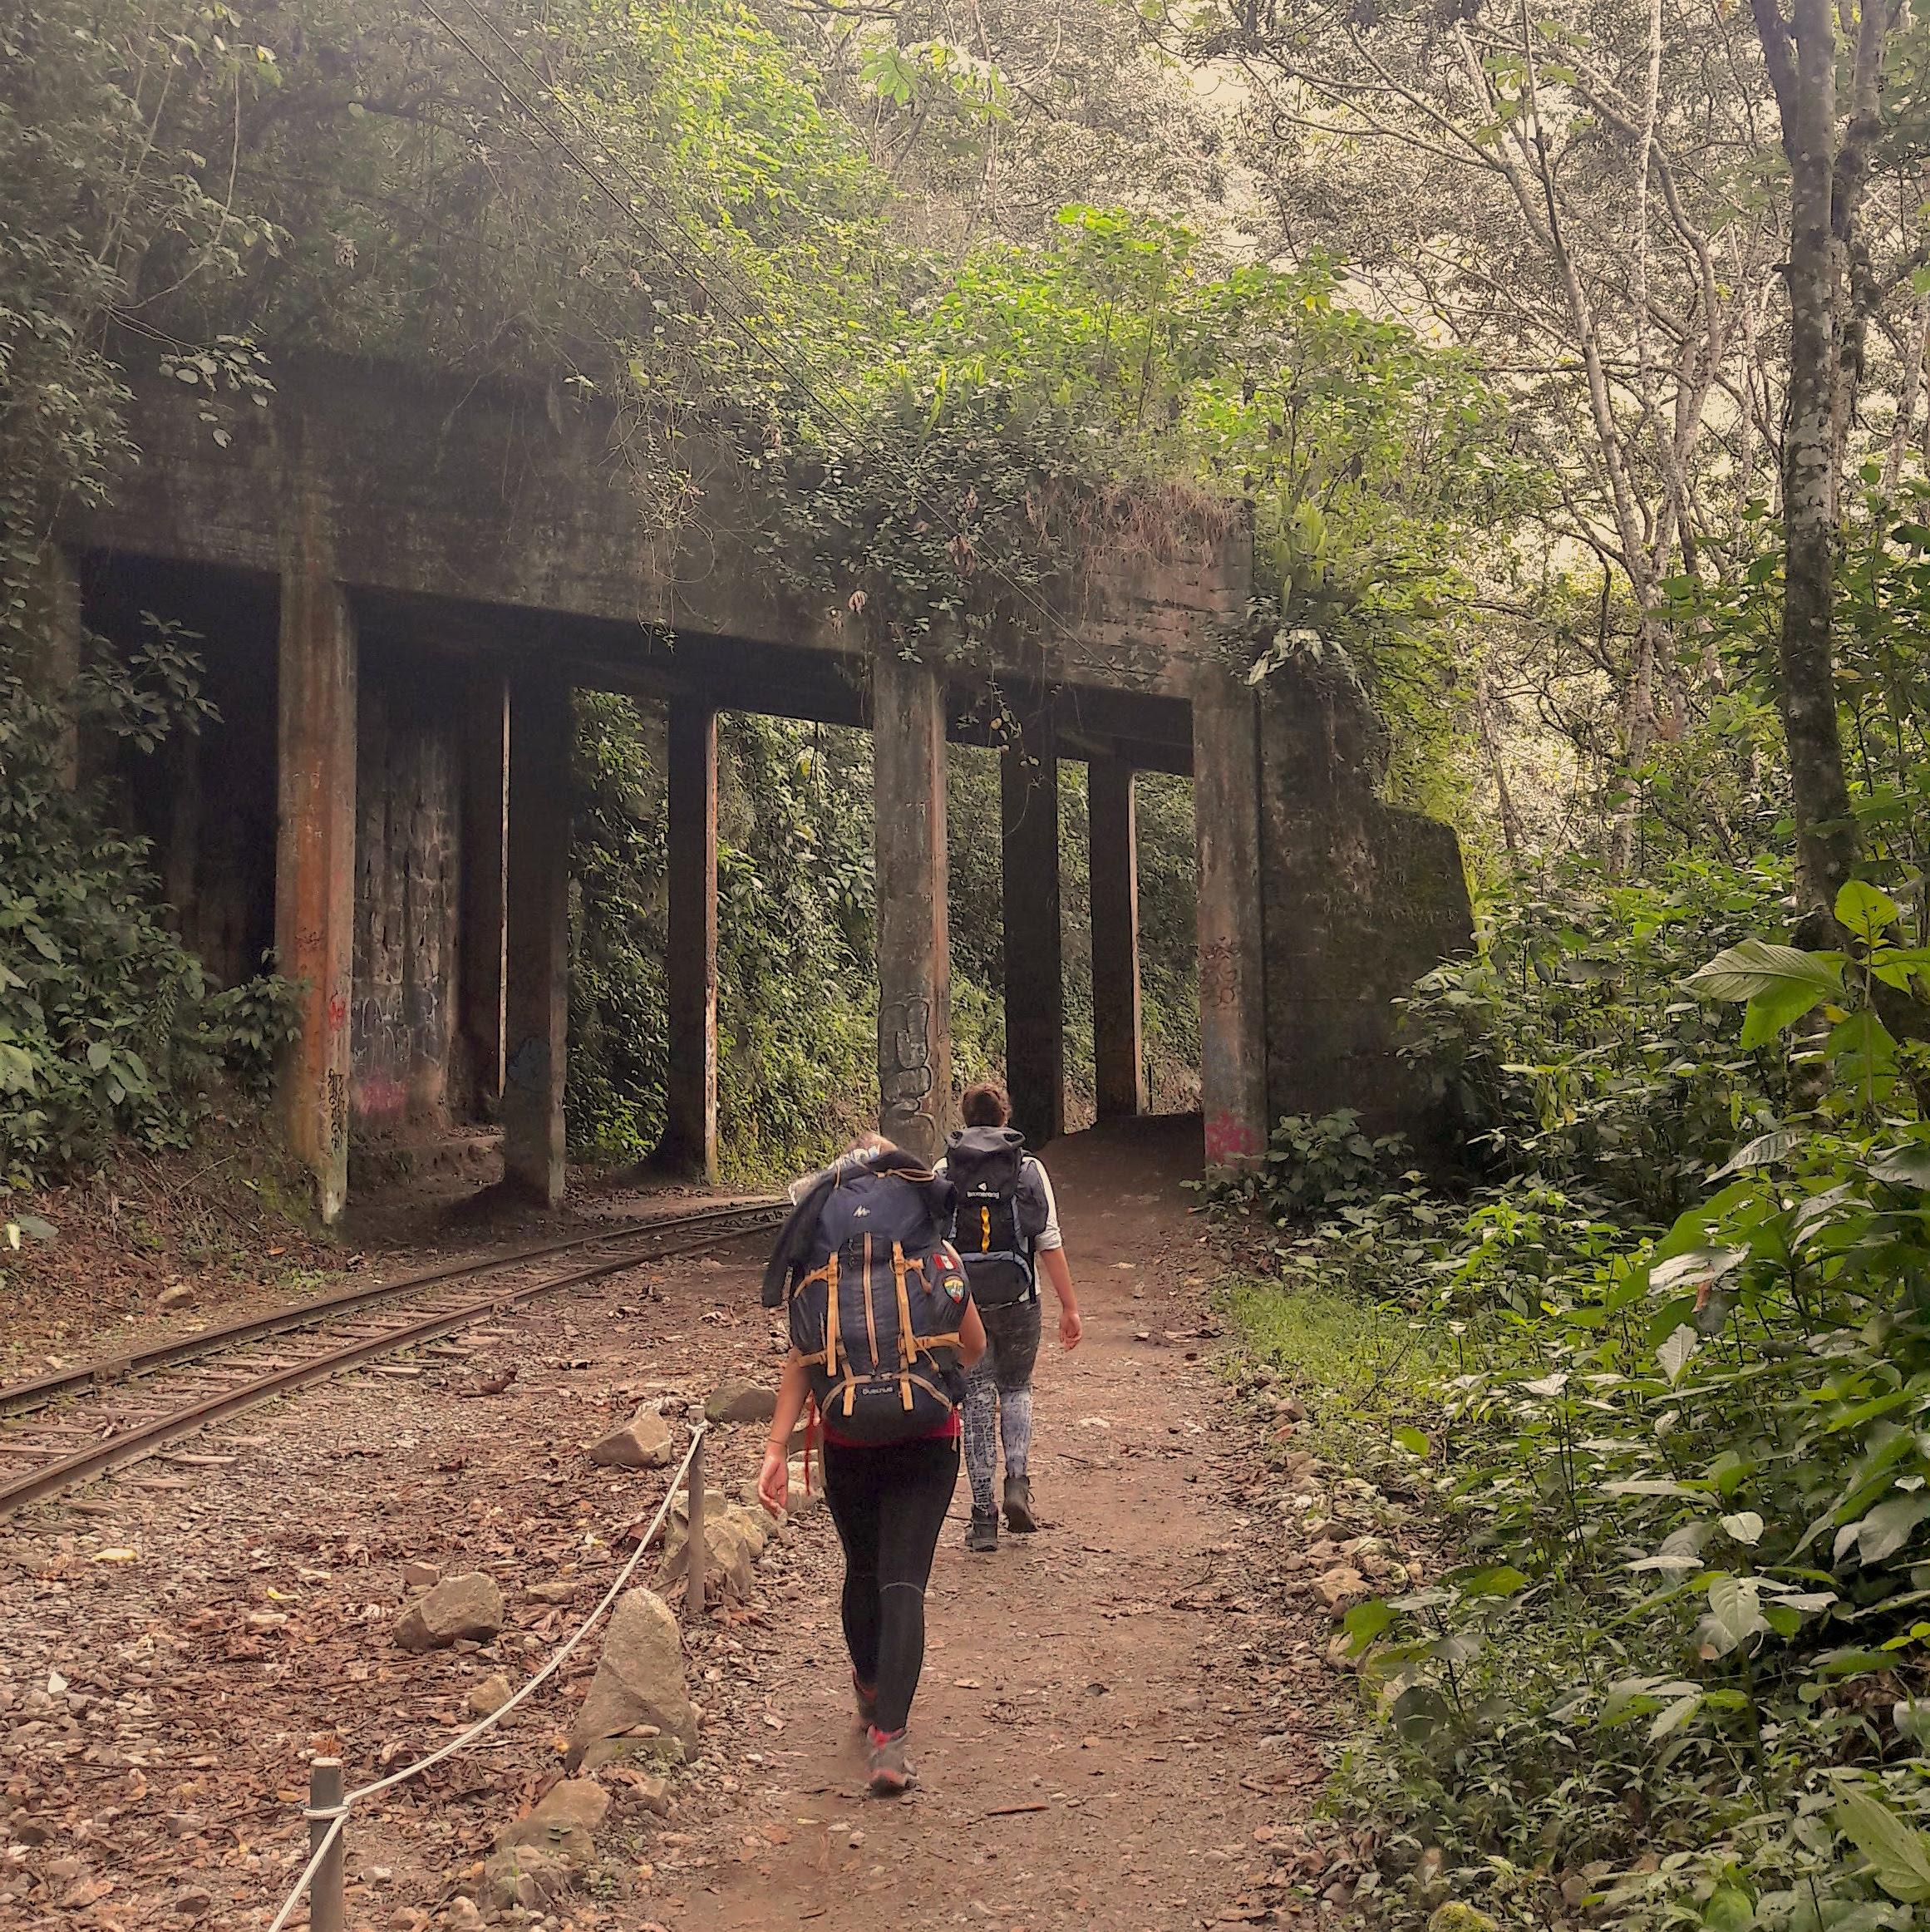 Two women with backpacking backpacks walking alongside train tracks towards a tunnel.